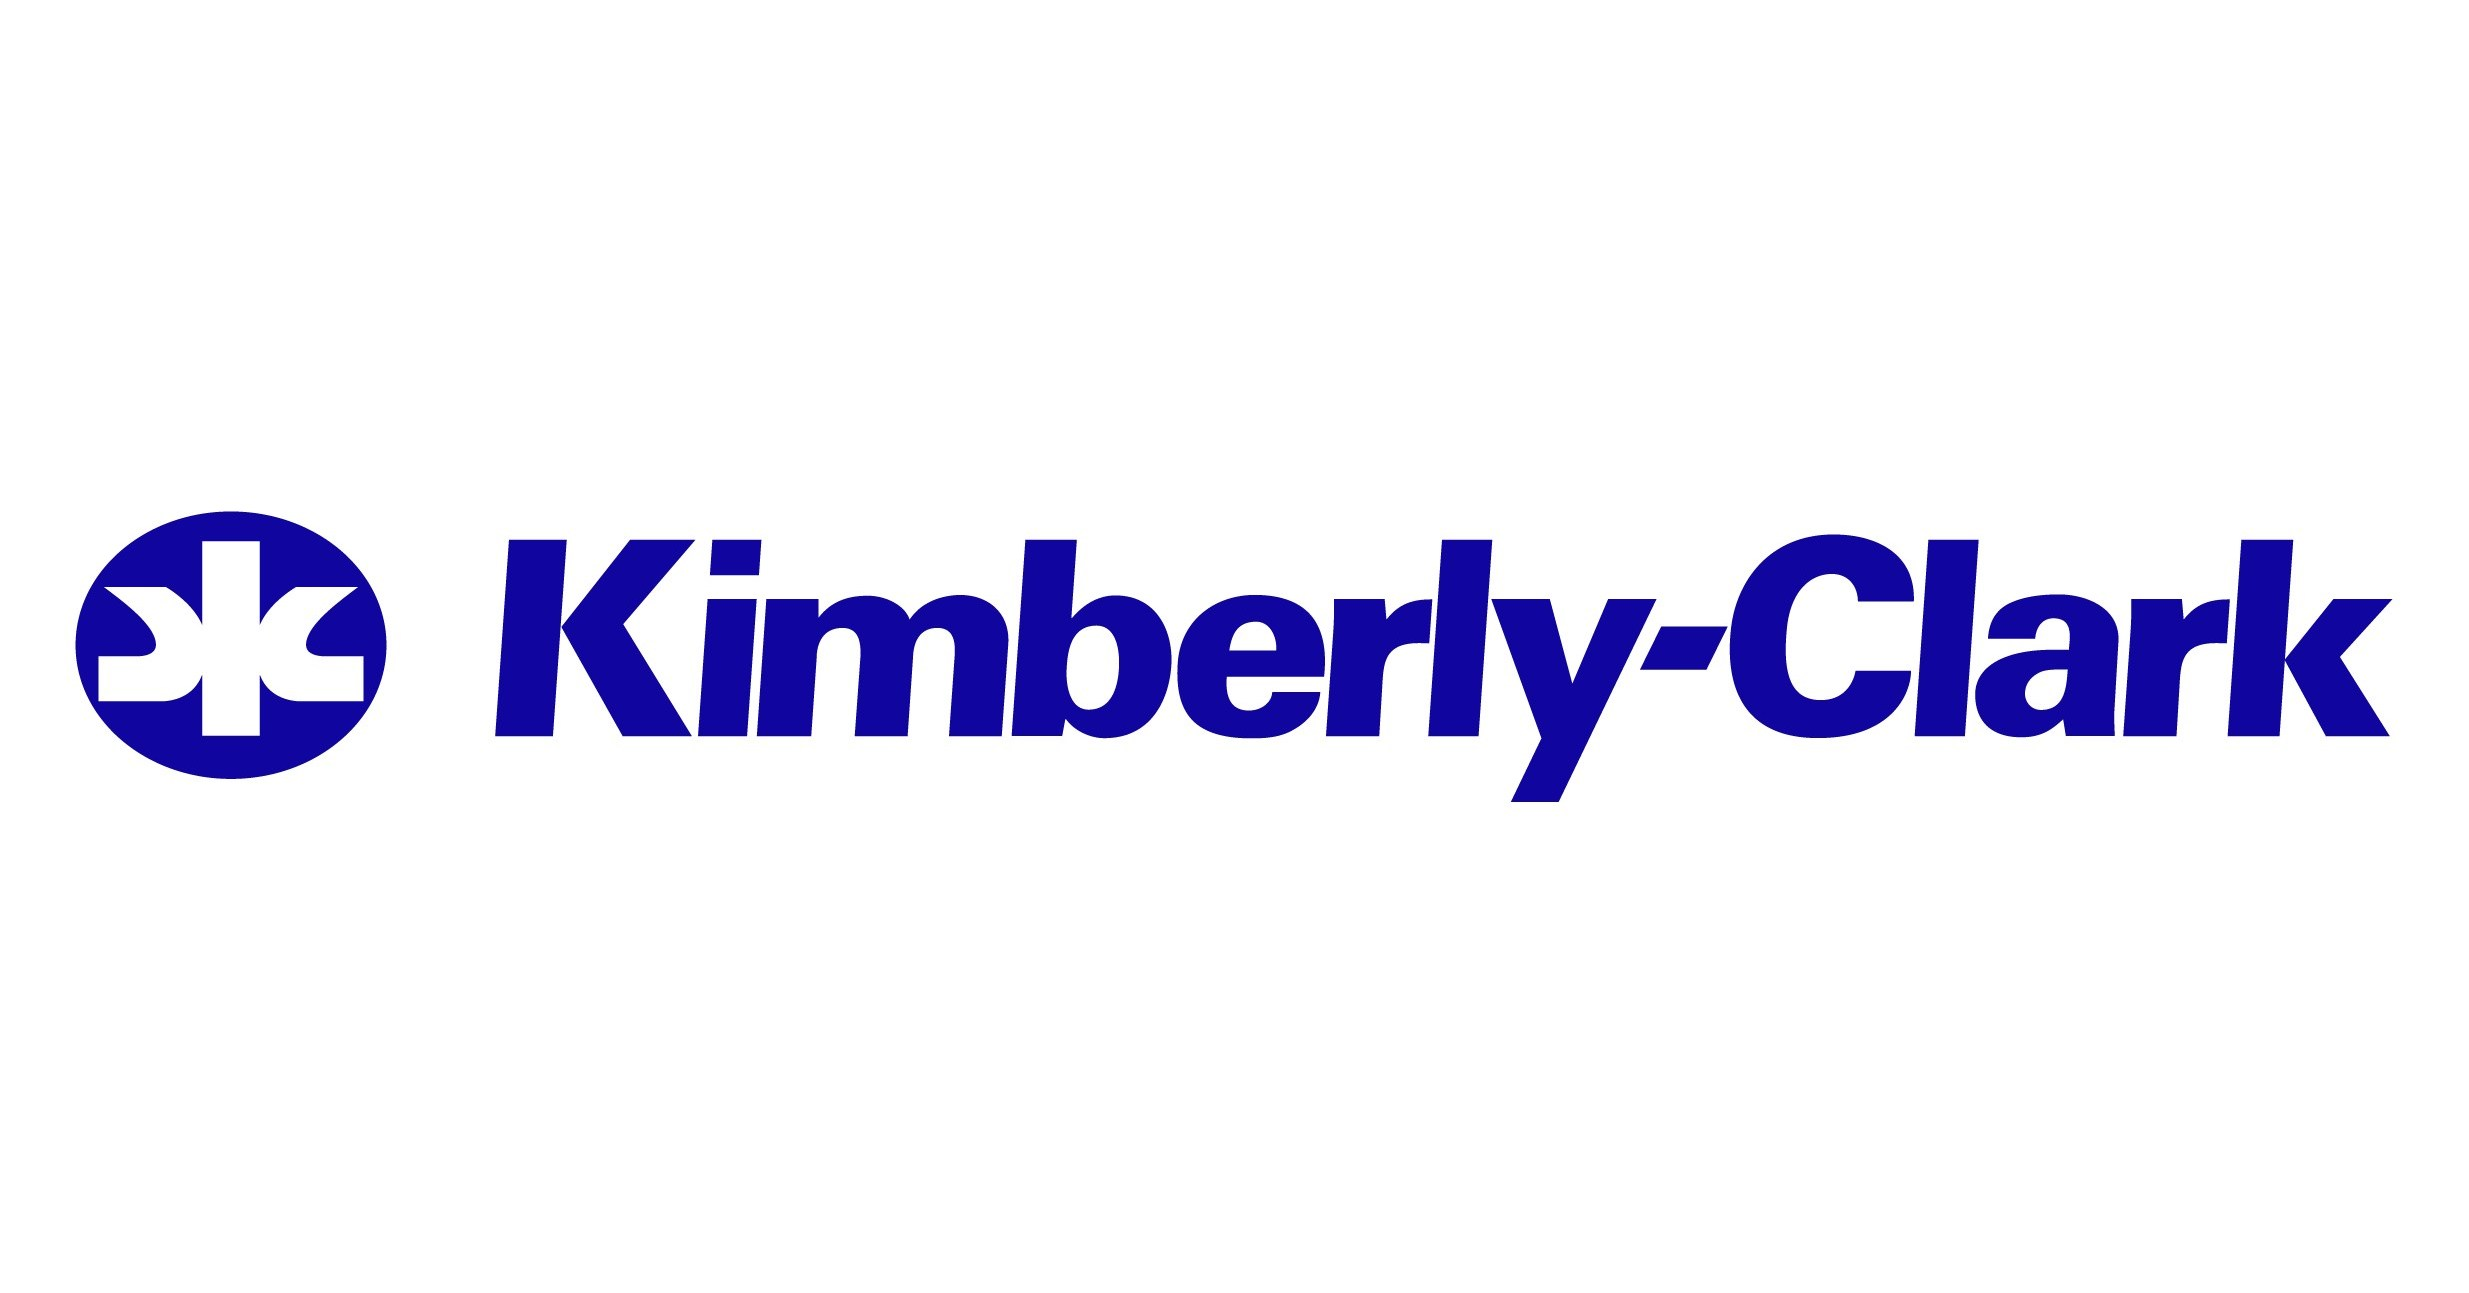 Kimberly Clark RGB Blue Logo jpg?p=facebook.